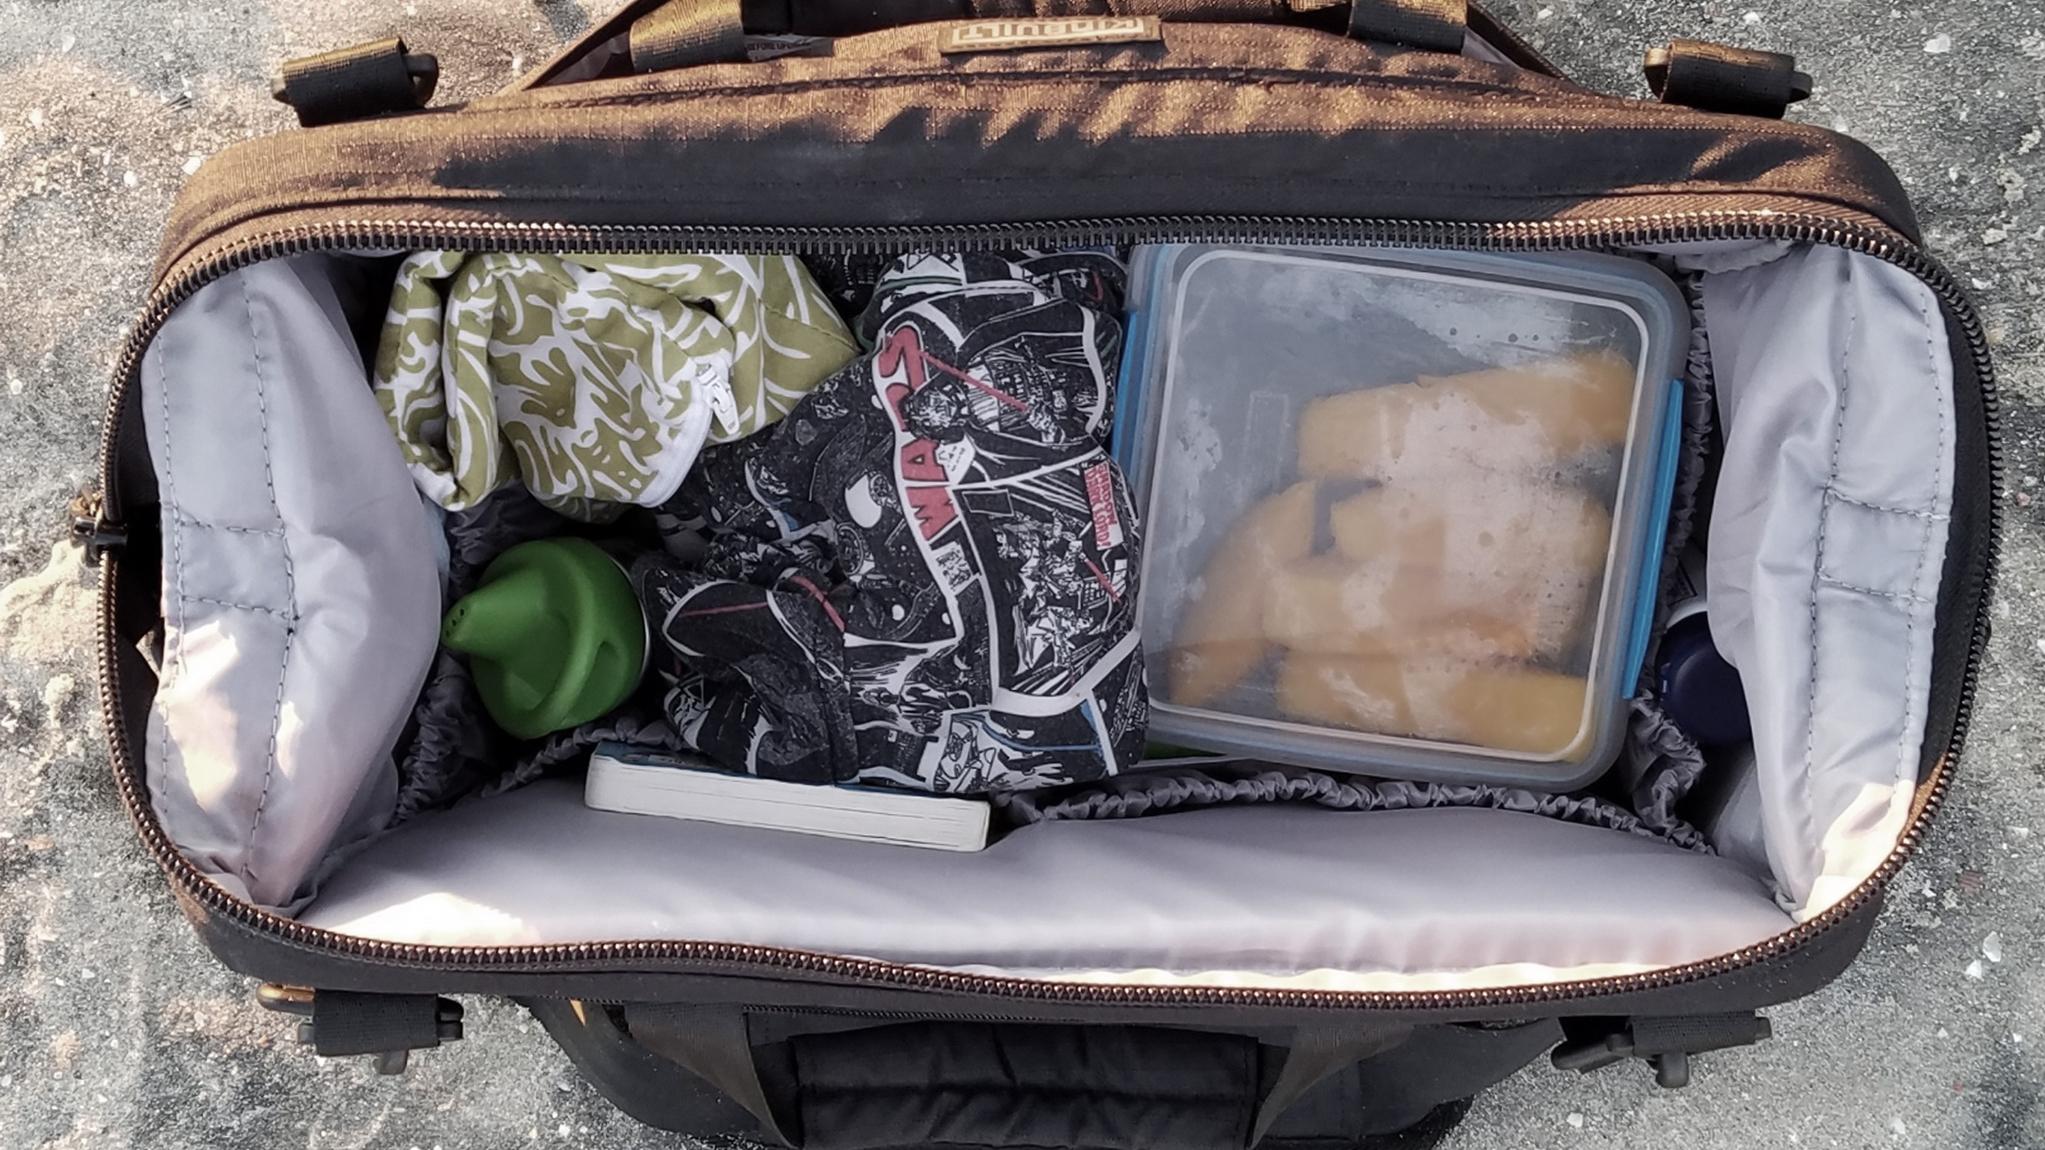 KINBUILT Diaper Bag Interior Storage